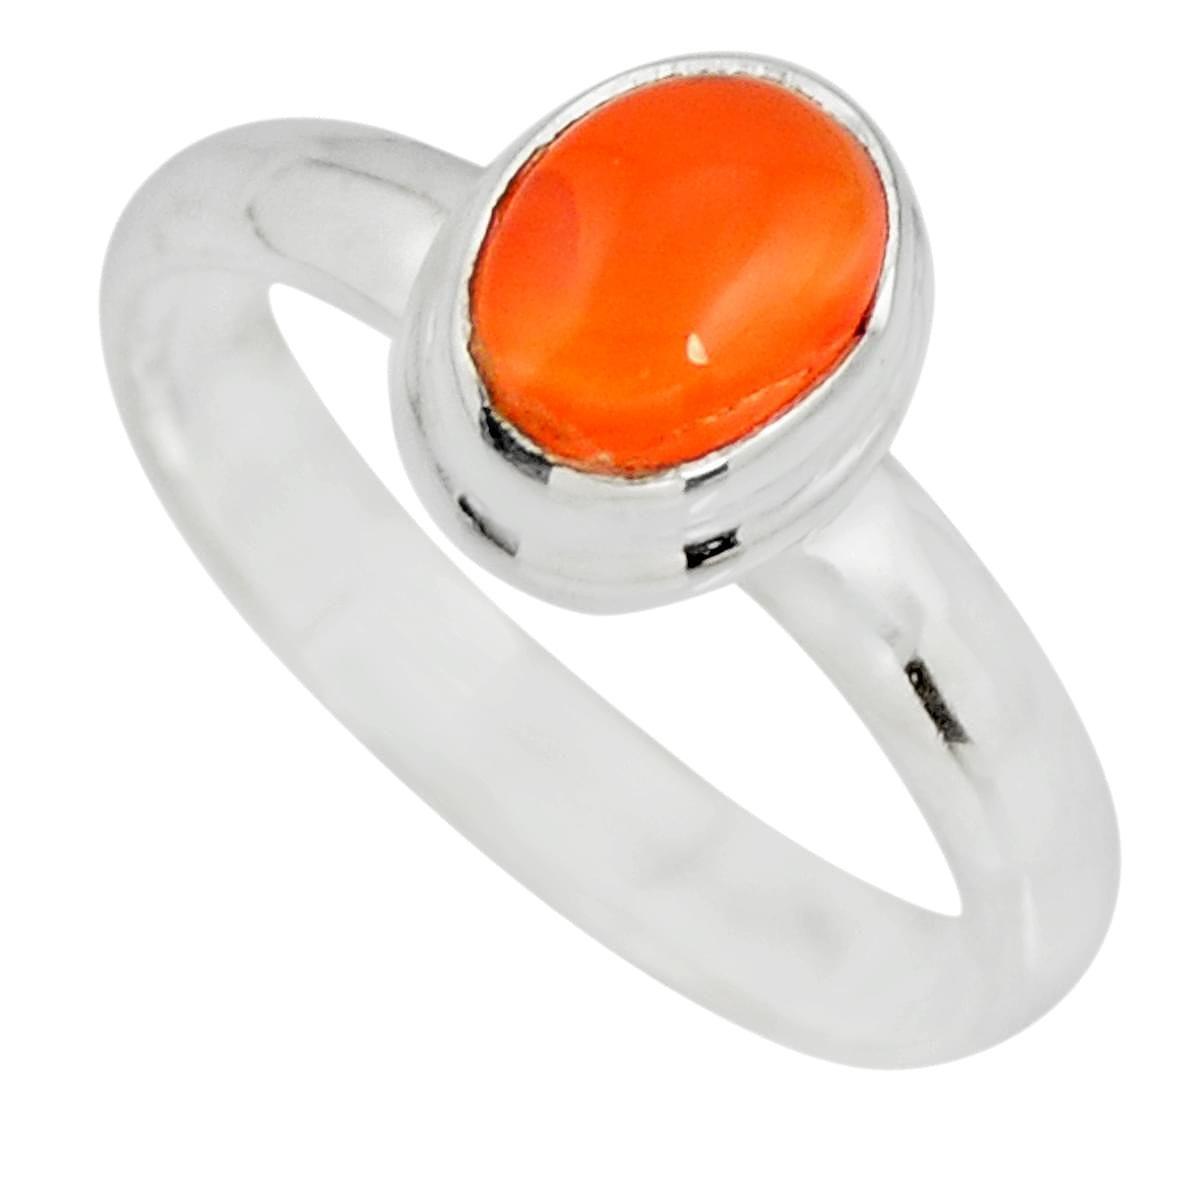 Natural Carnelian Ring 925 Sterling Silver Handmade Jewelry Size 7.5 Vu38988